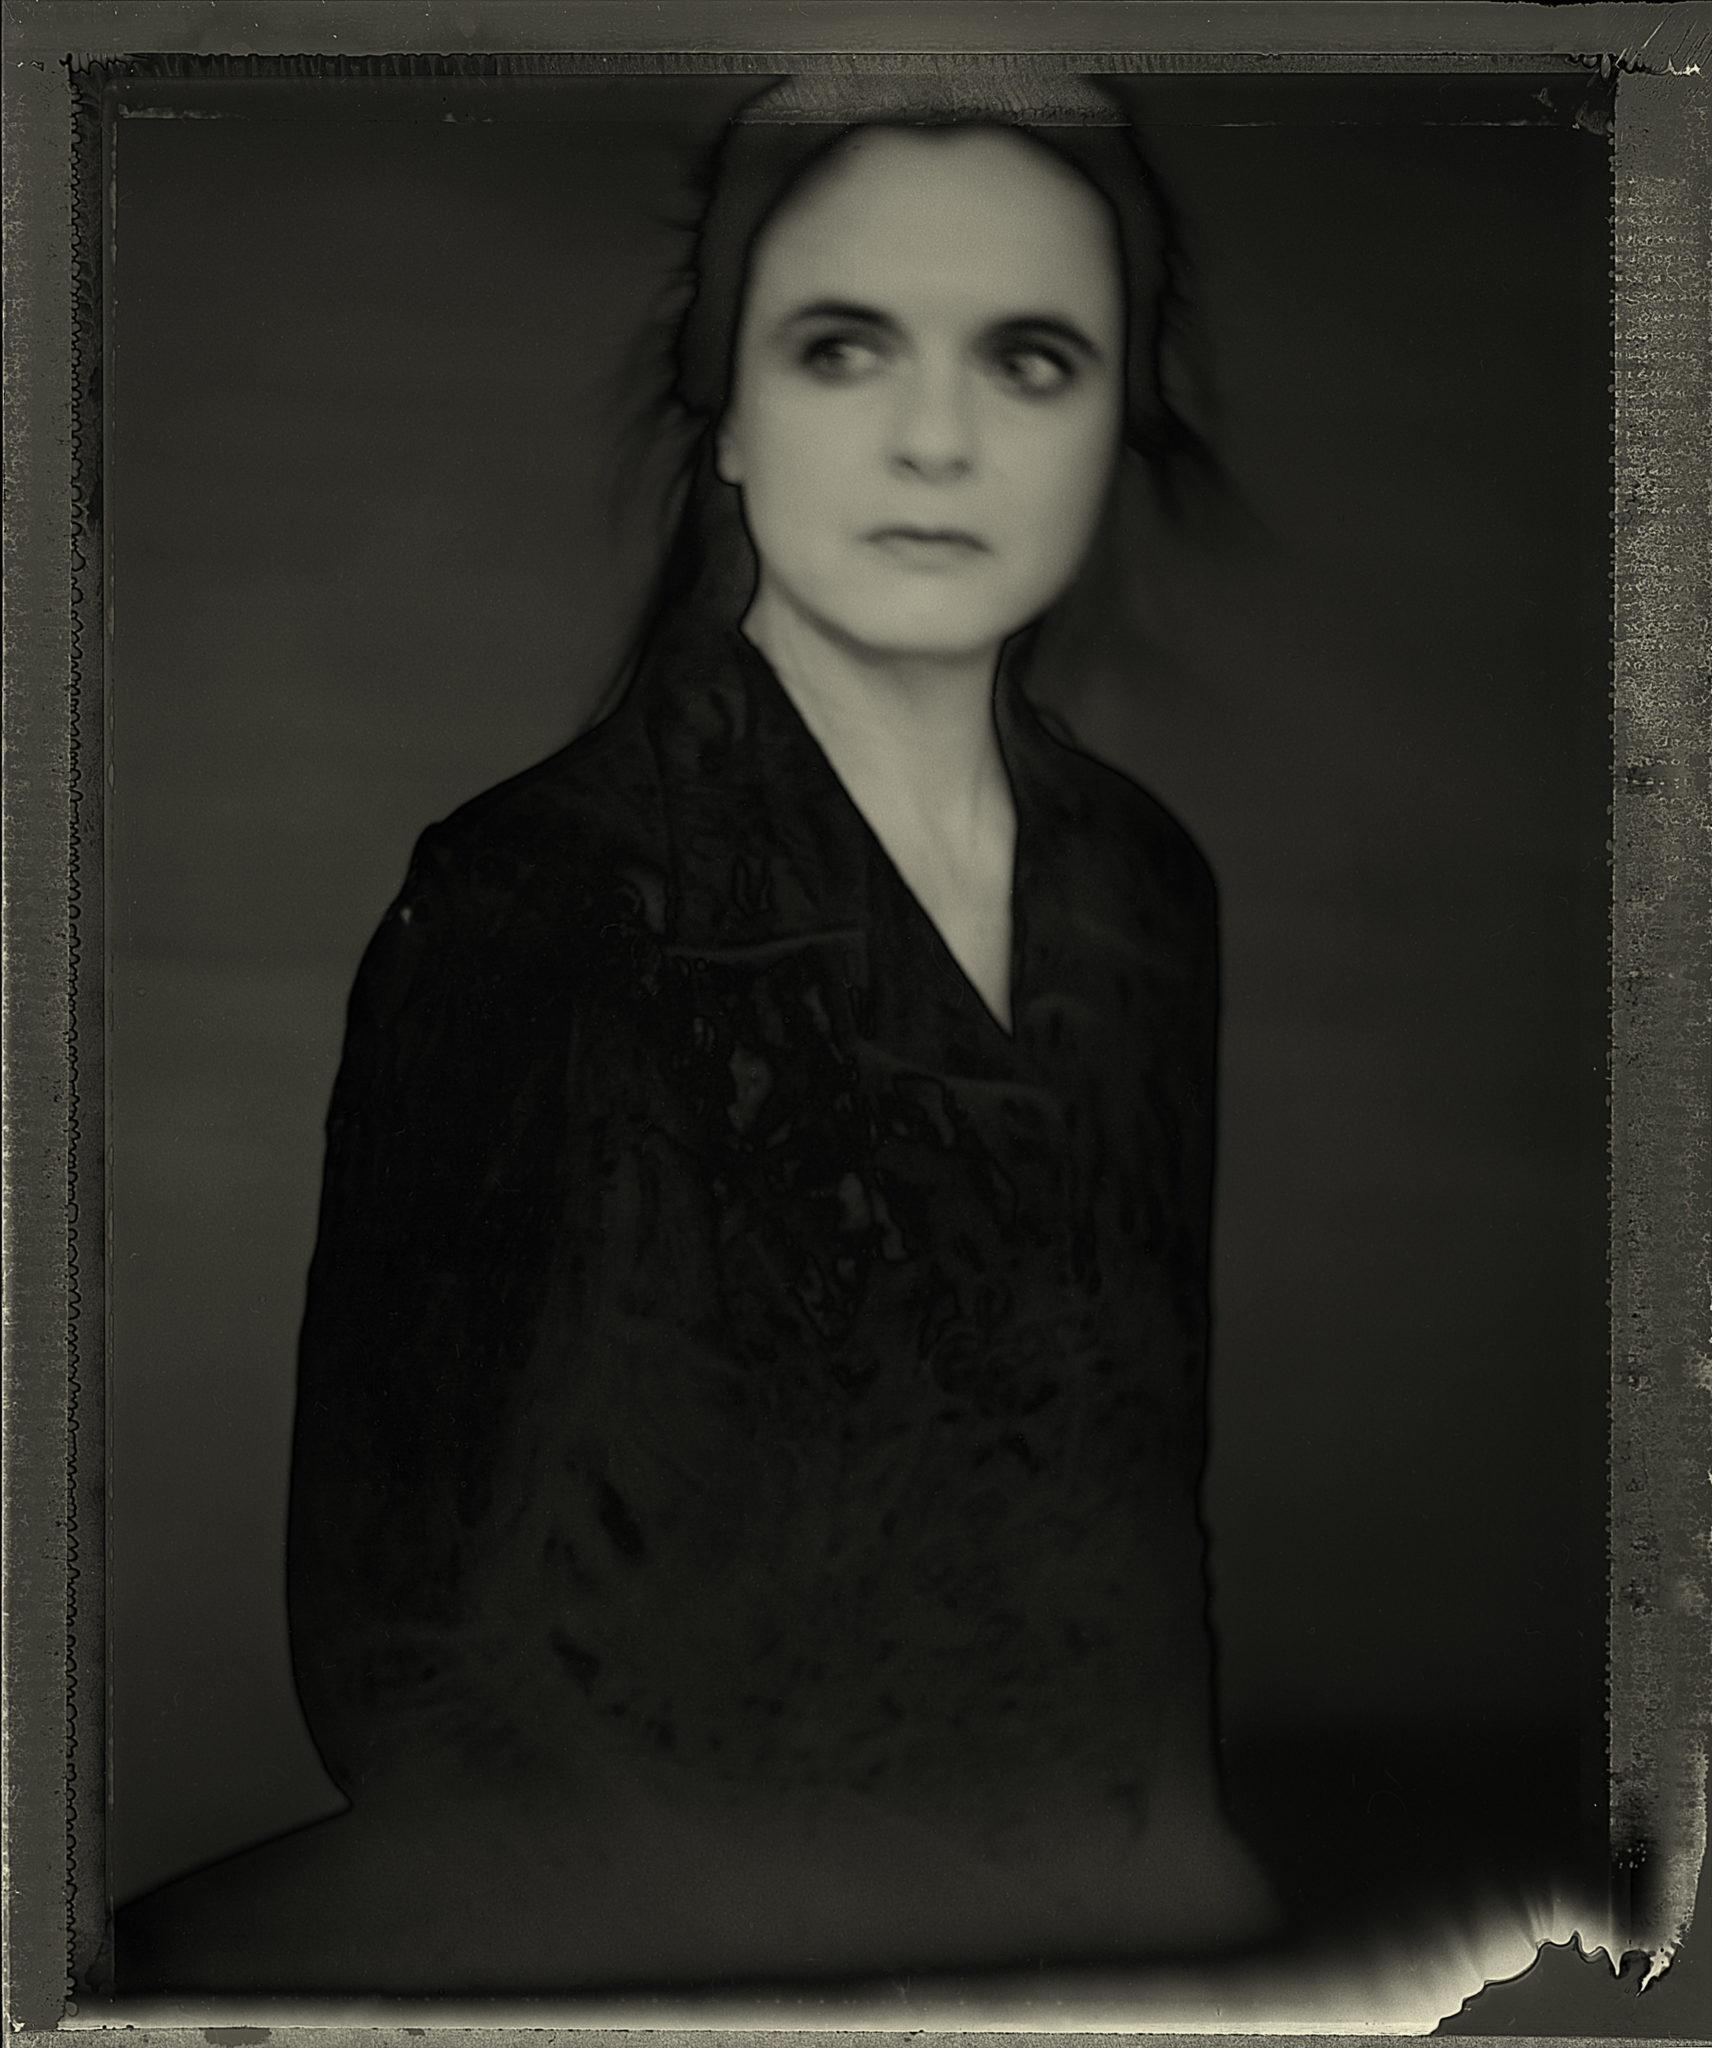 SarahMoon2